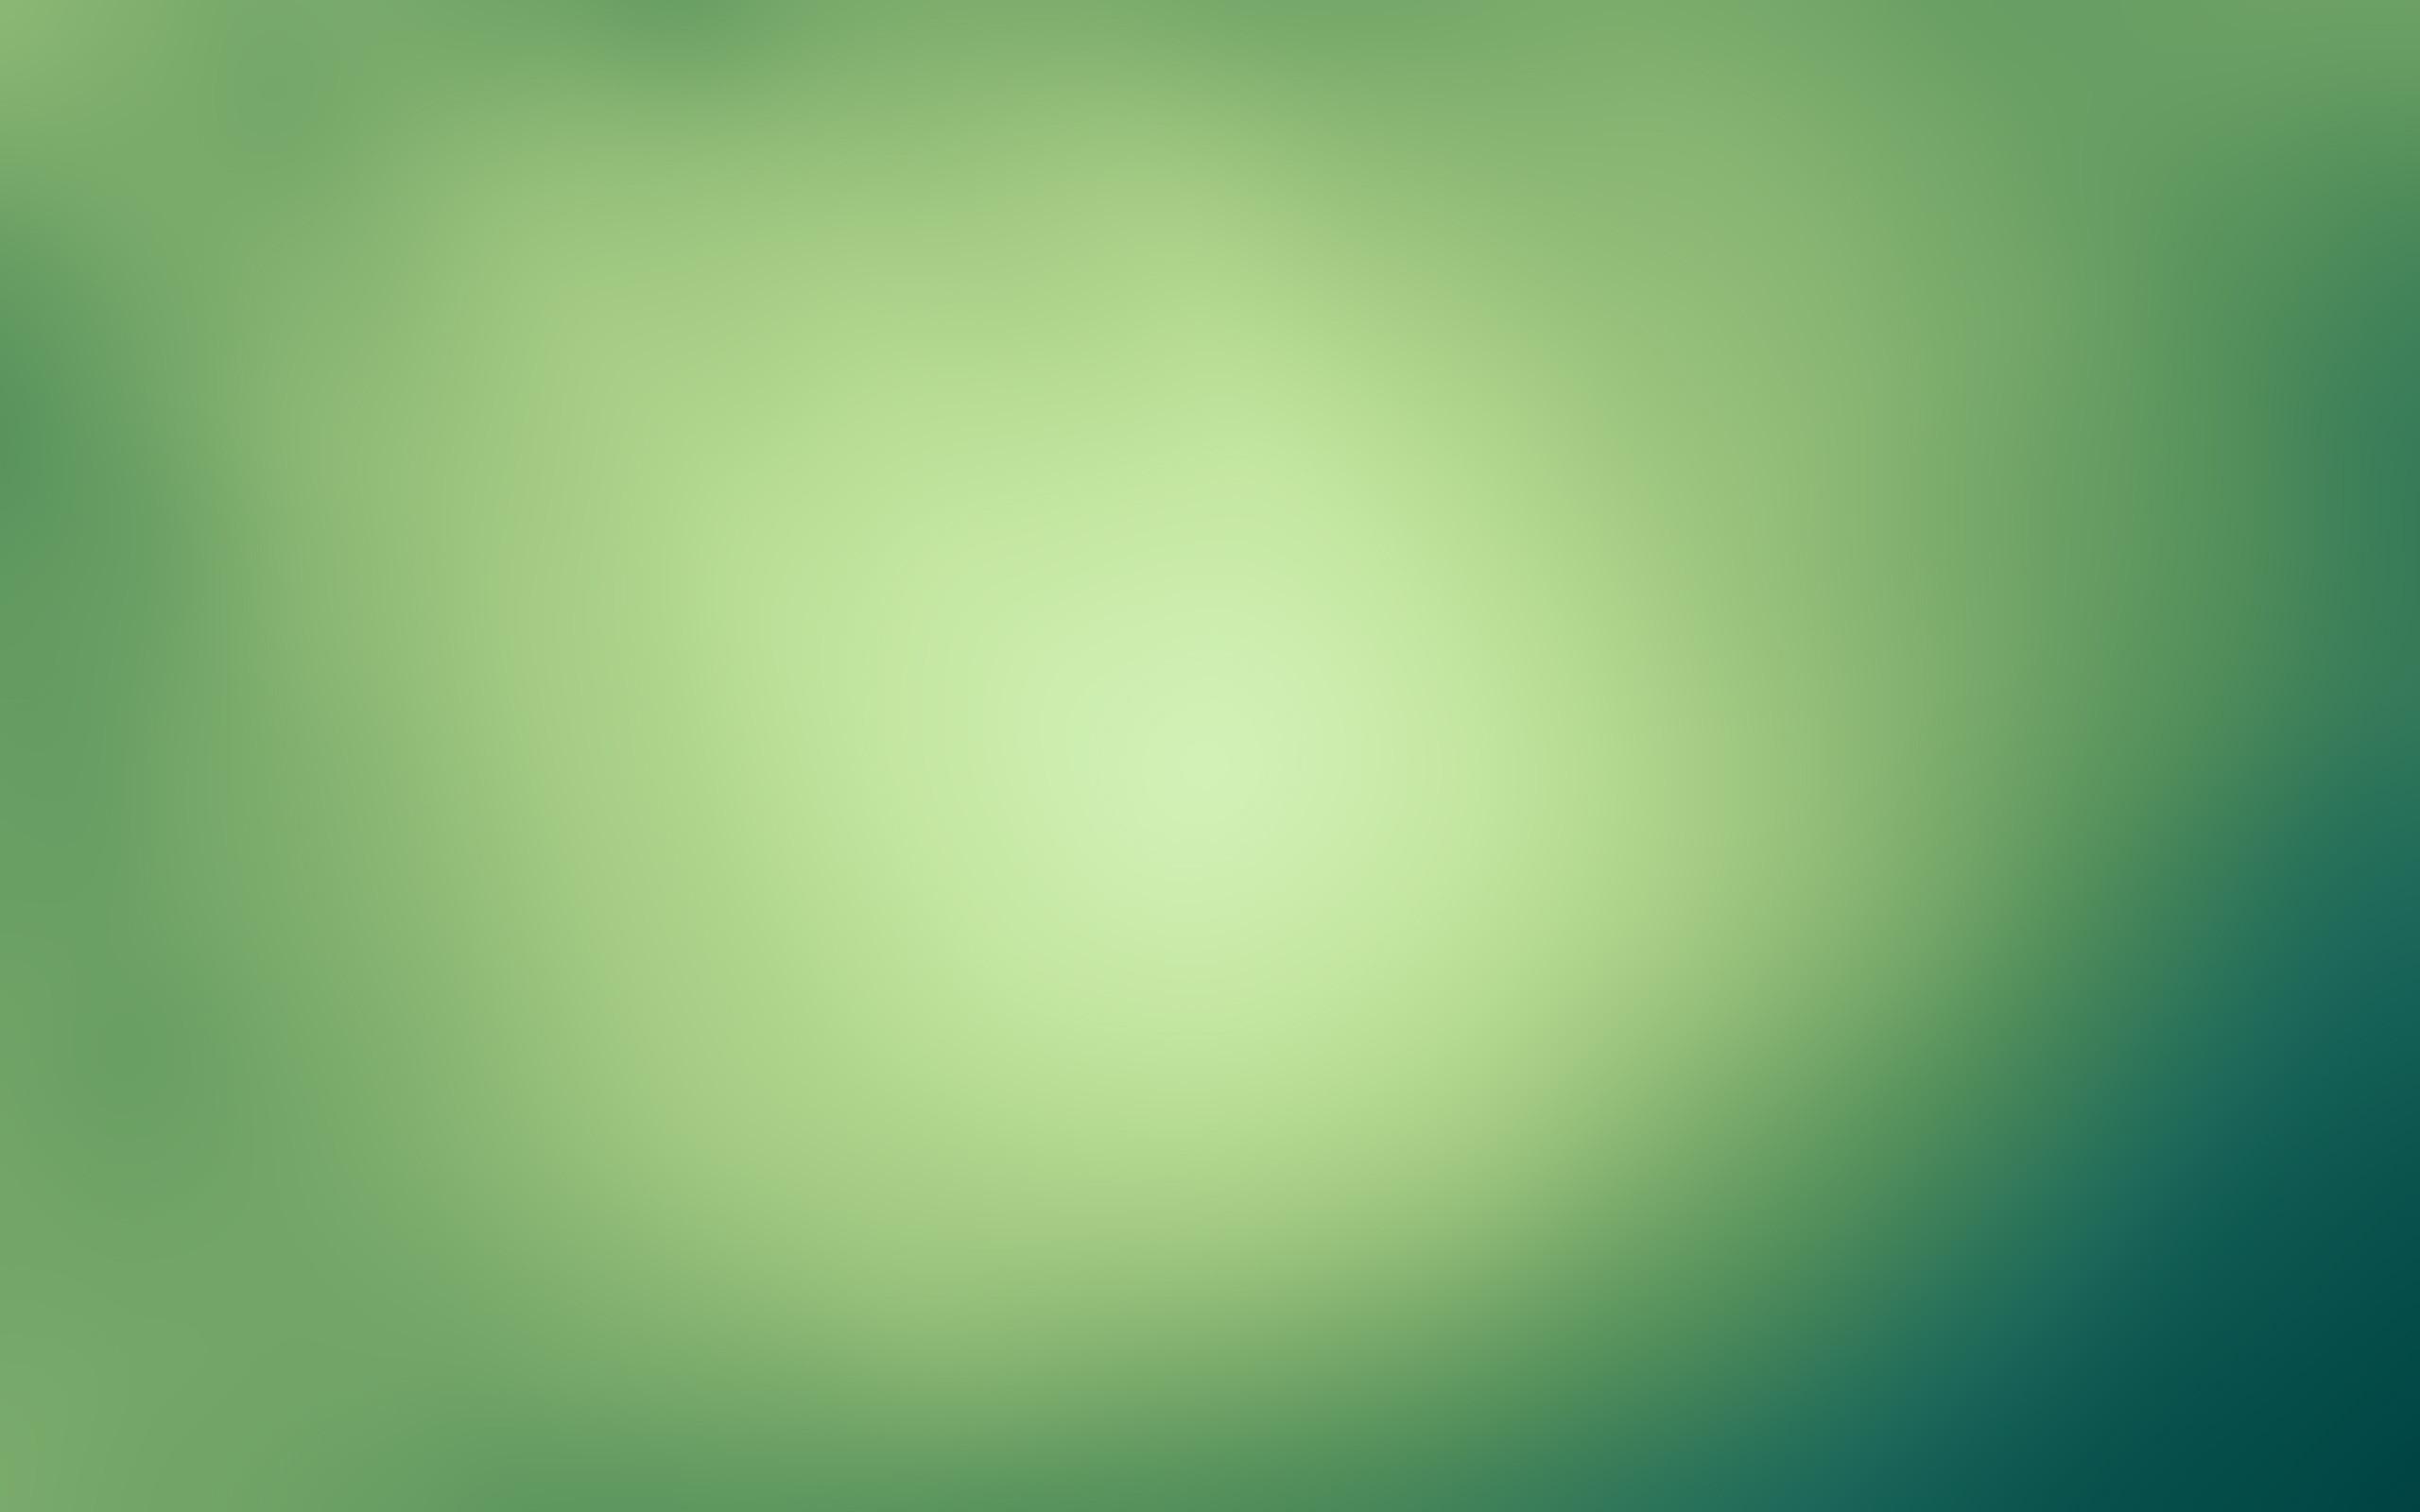 2560x1600 Wallpaperwiki Green Light Plain Line Background PIC